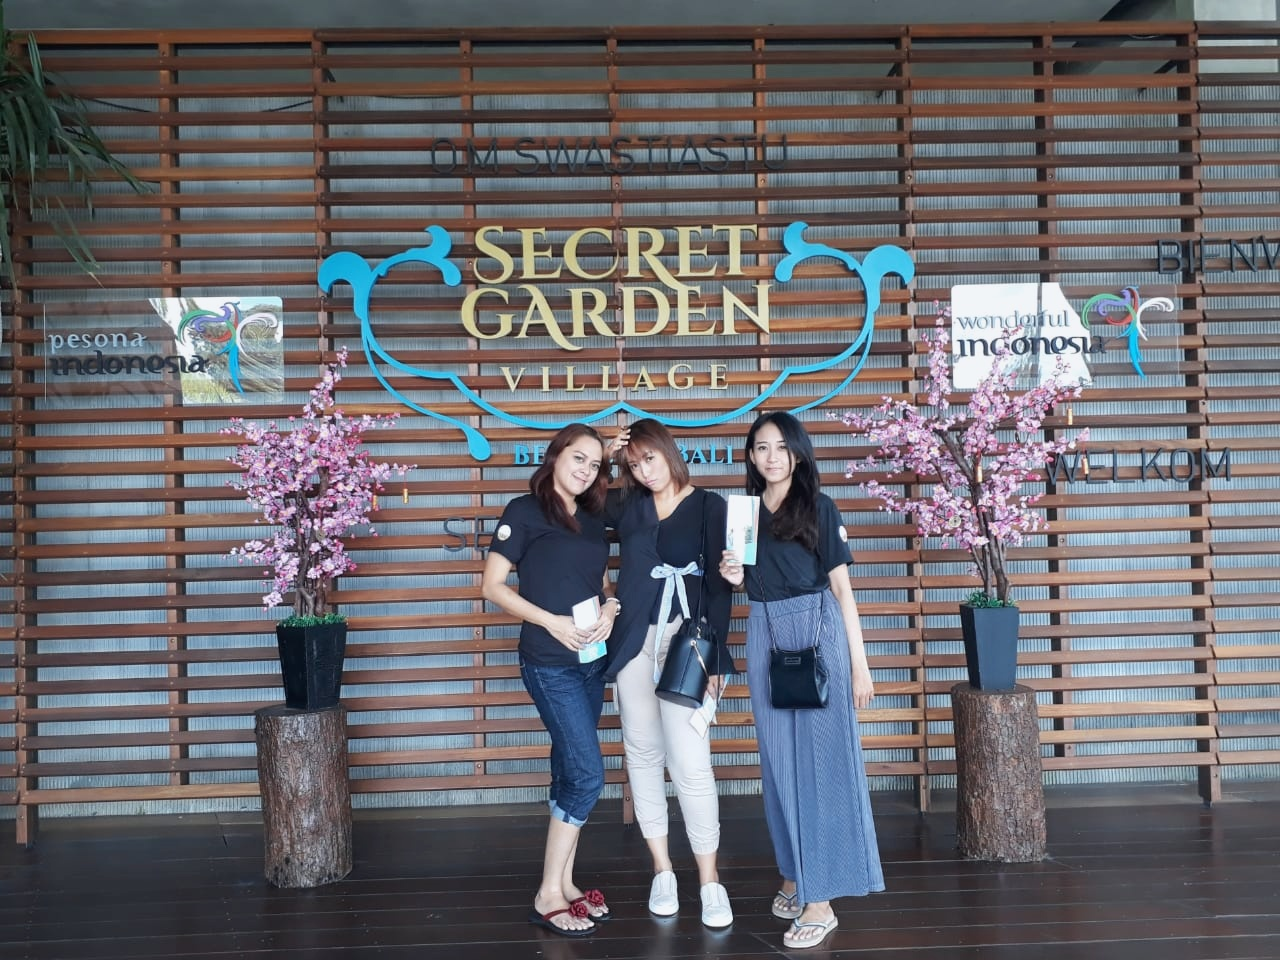 Outdoor Act - Secret Garden Village - Lobby